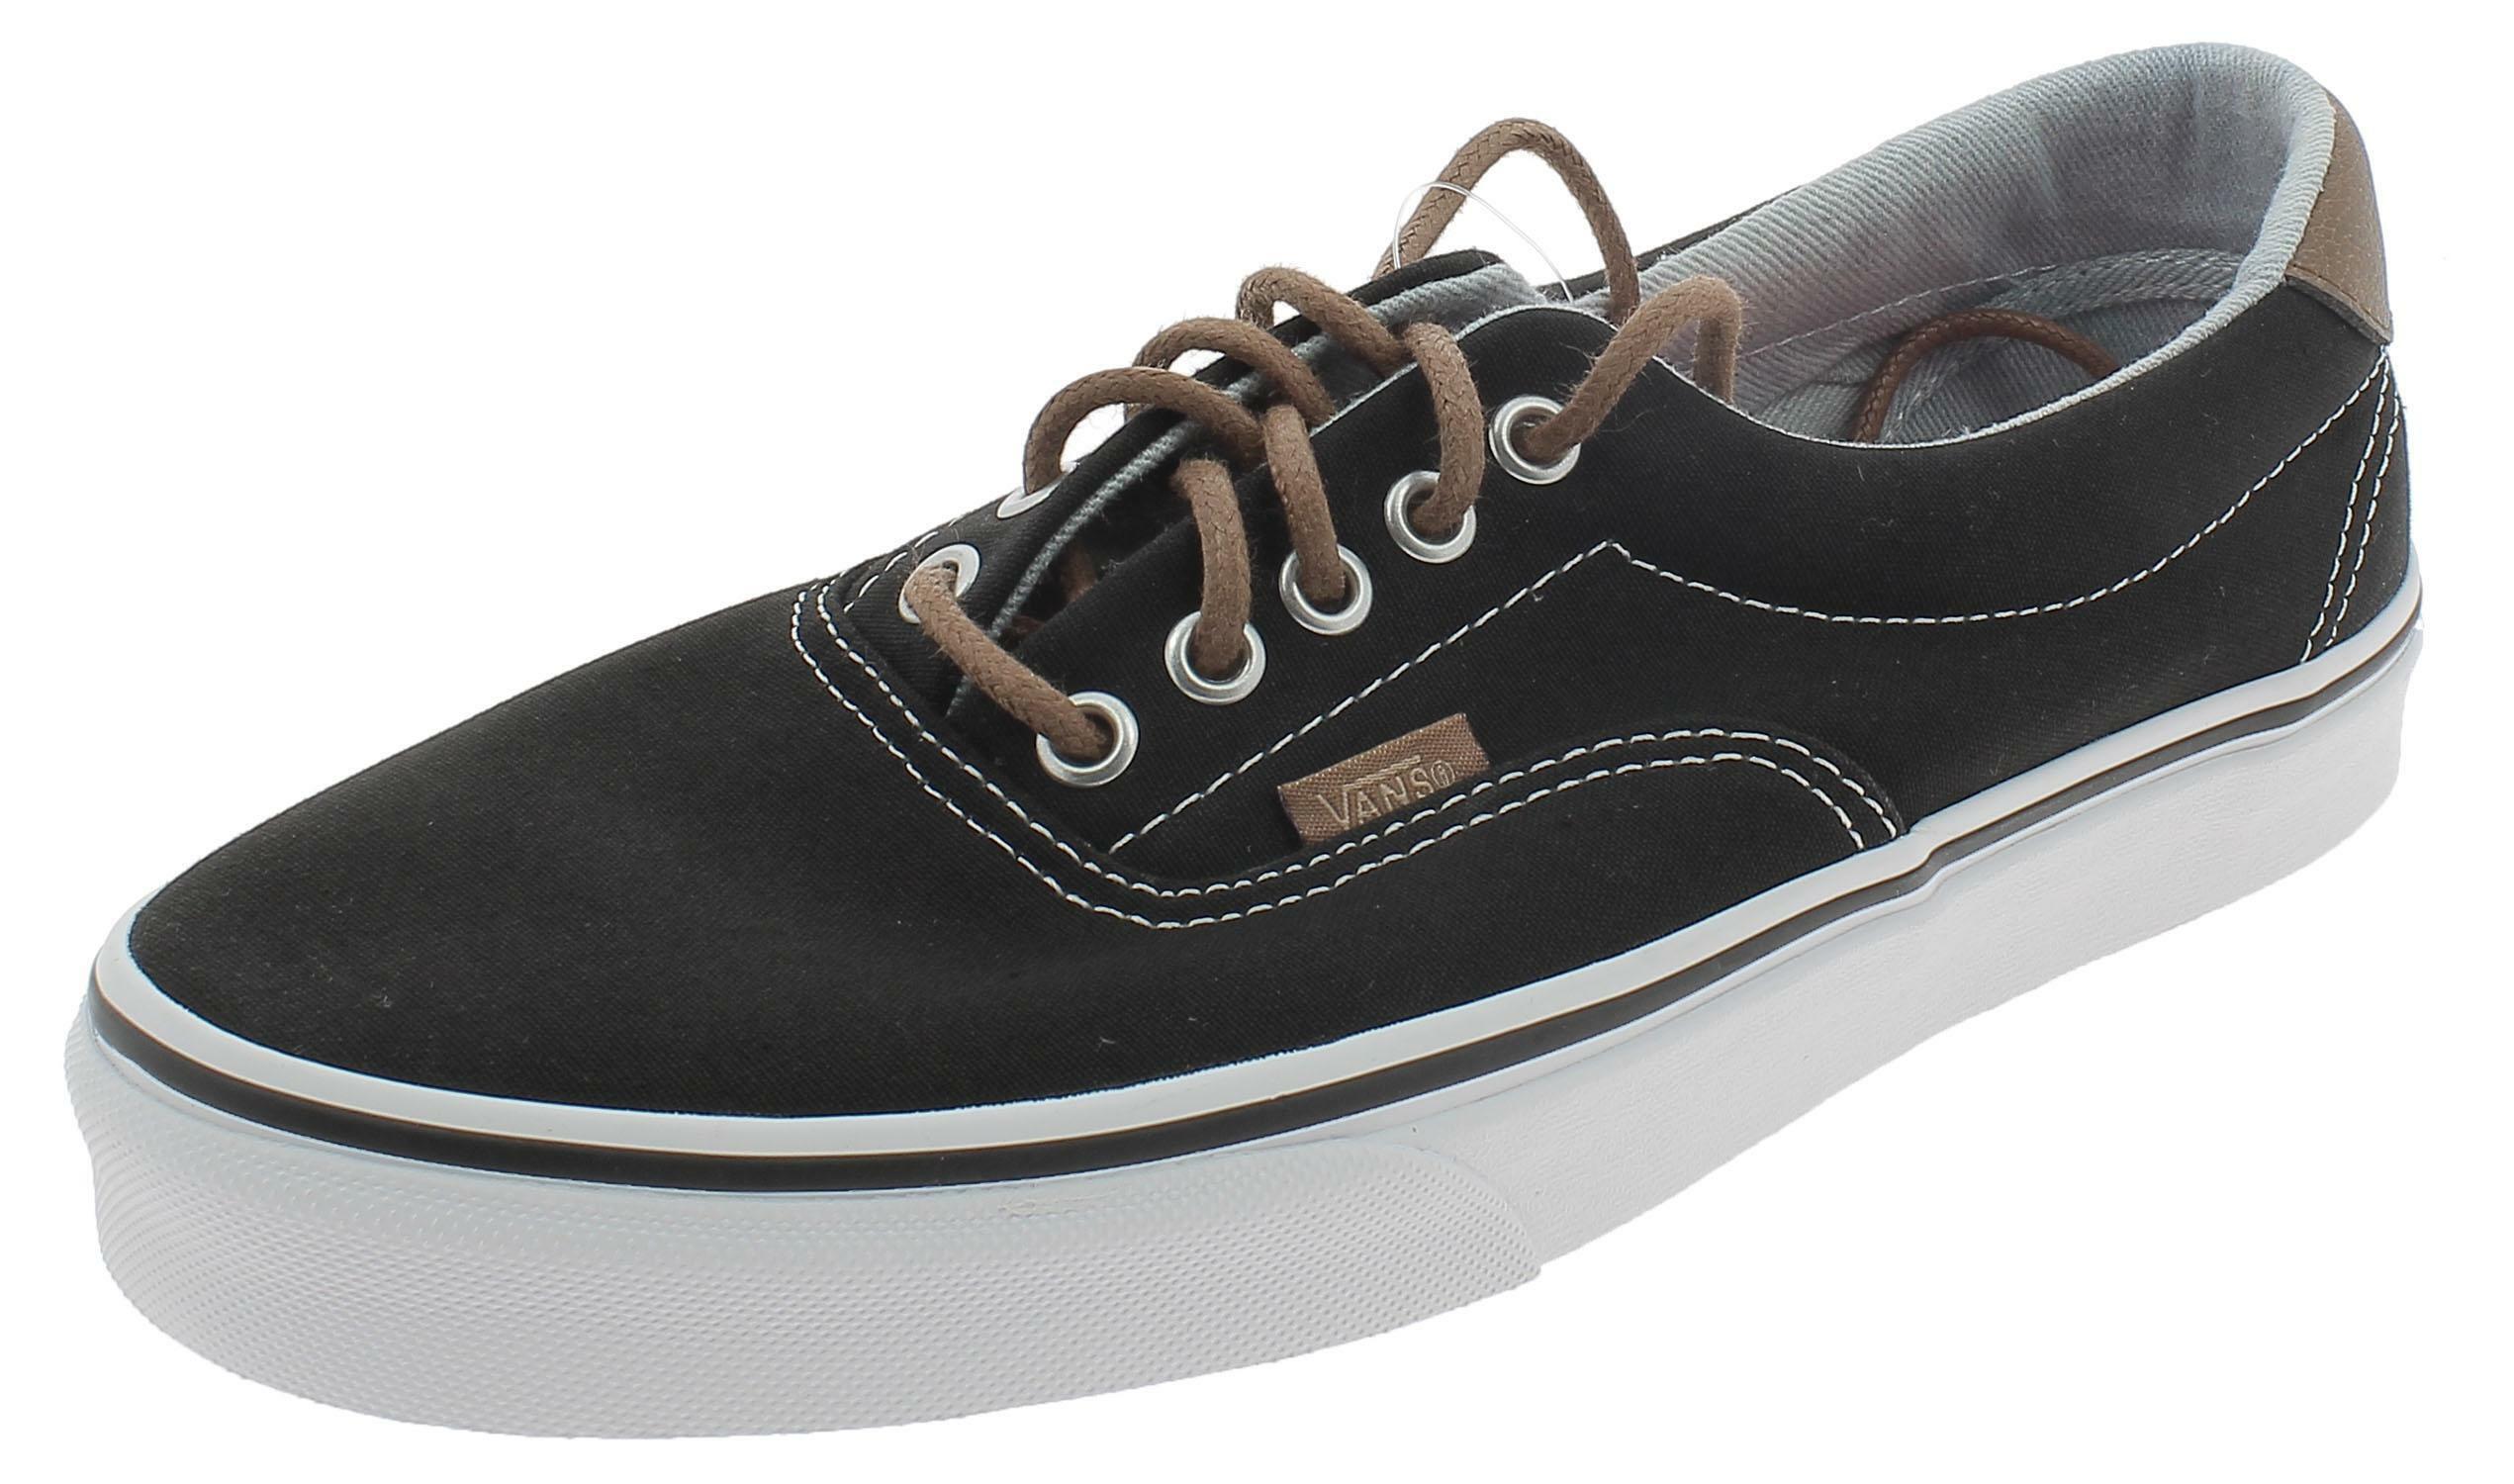 Vans era 59 scarpe sportive uomo nere vn0a38fsqk31